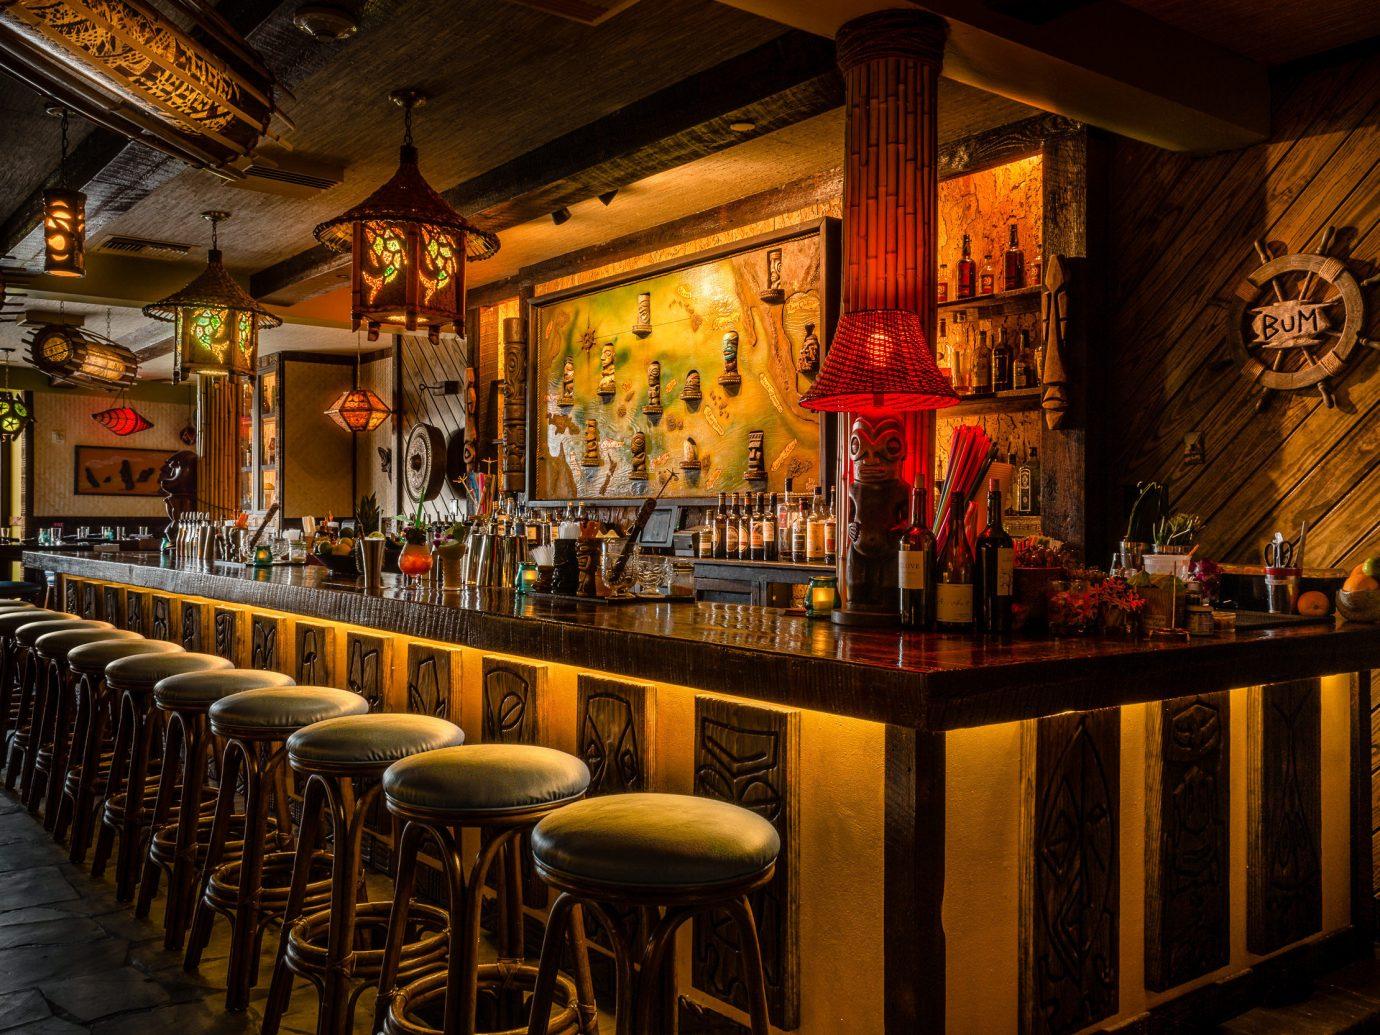 Boutique Hotels Hotels Trip Ideas indoor ceiling Bar interior design tavern pub restaurant several dining room